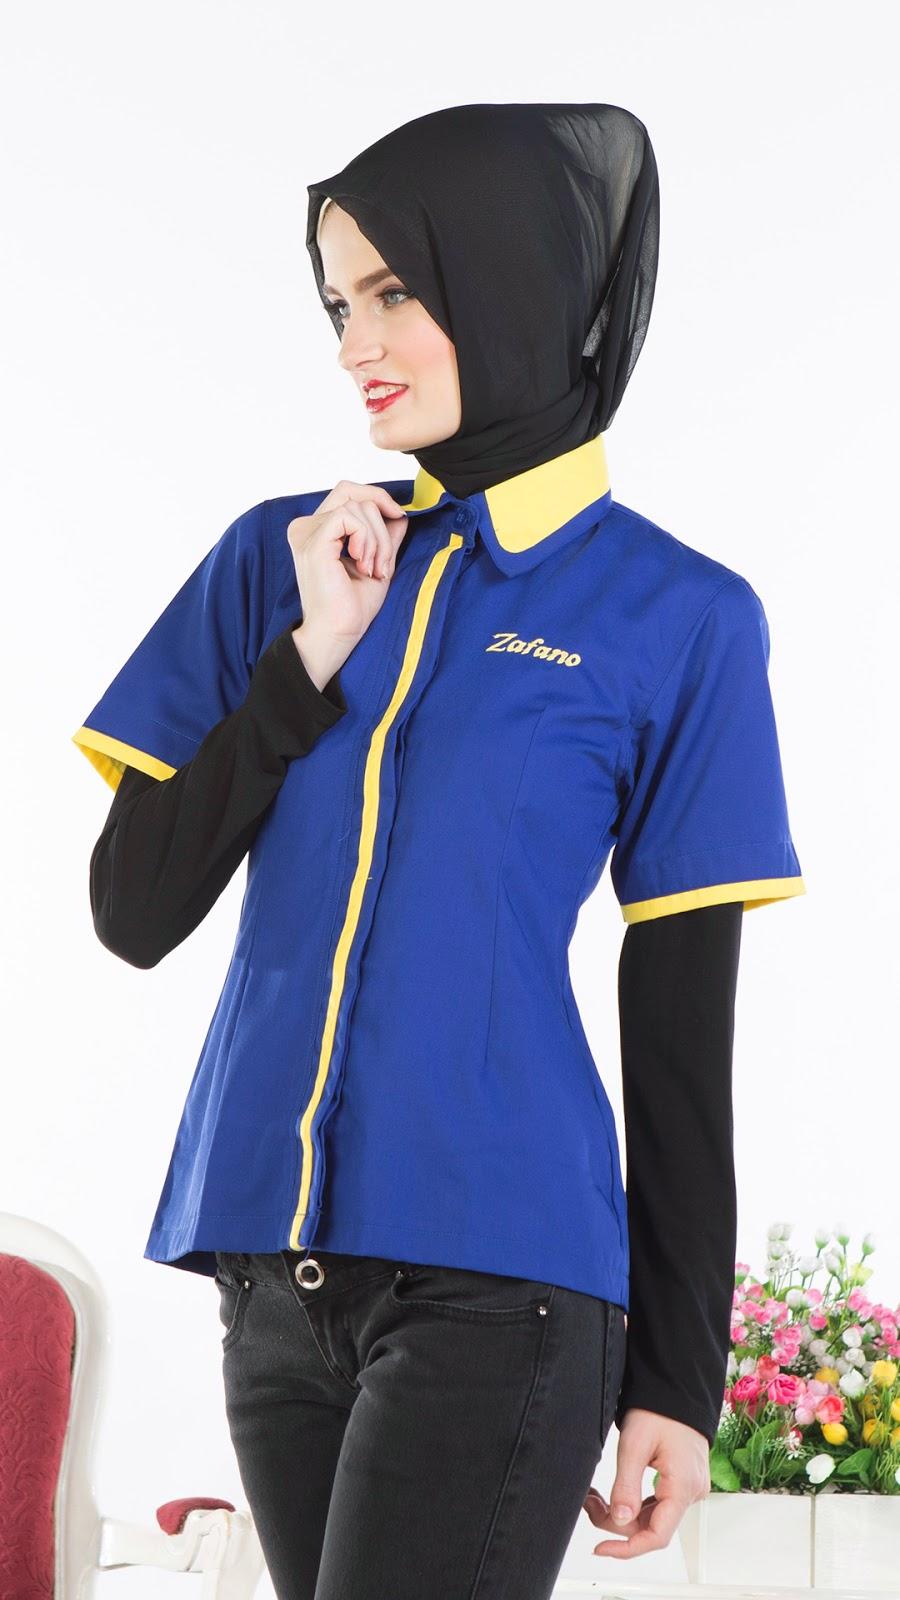 Wallpaper HD spg Cewek IGO emina hijab manis